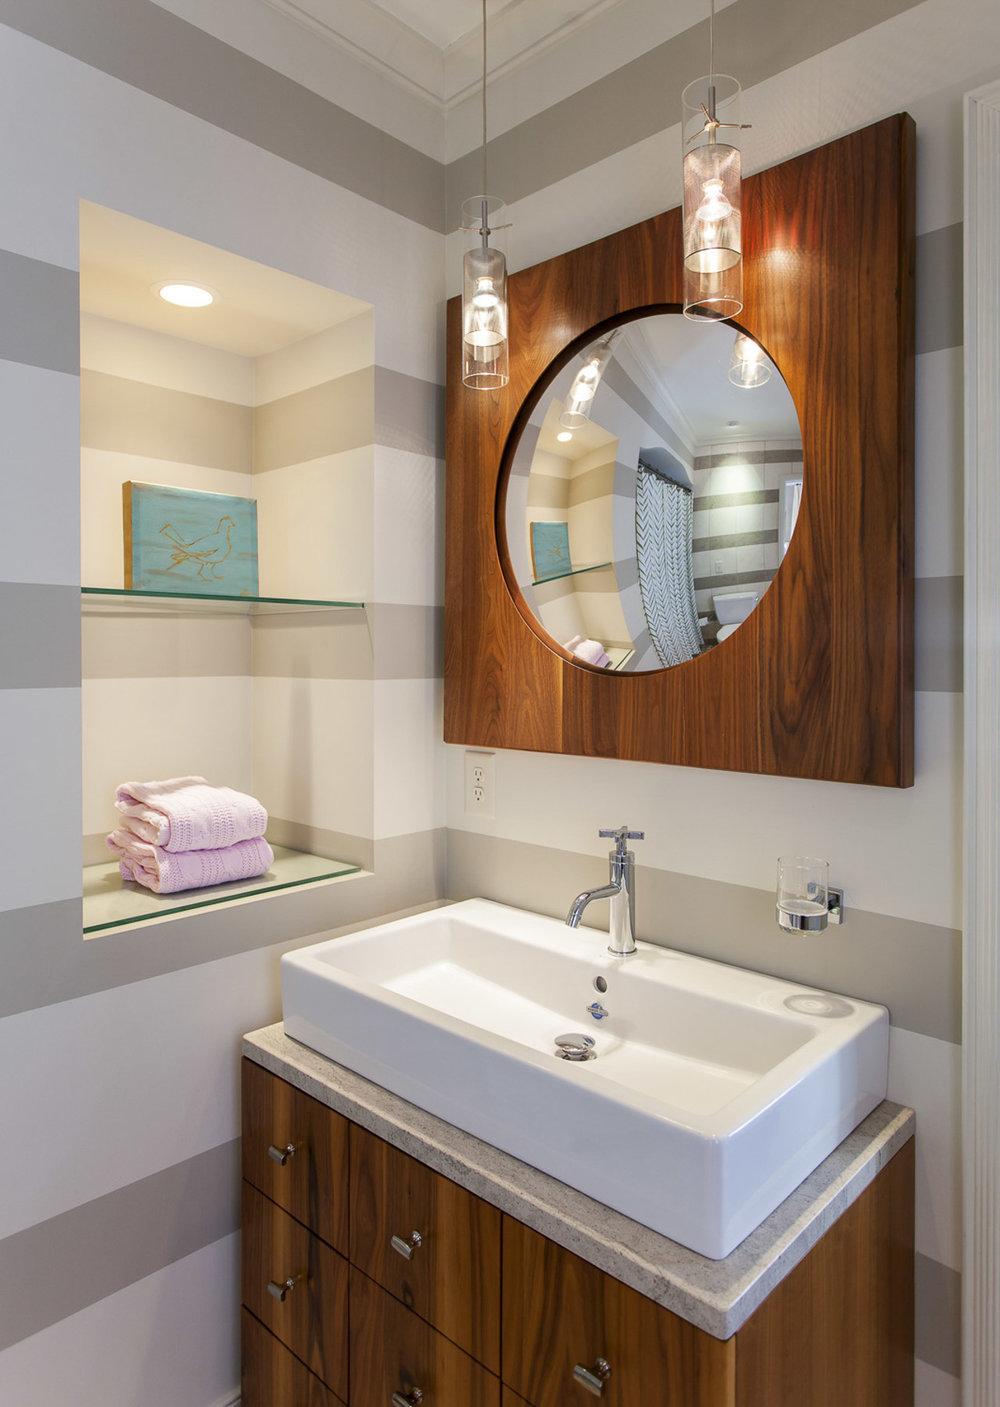 Charlotte_Advertising_Photographer-bathrooms-6.jpg